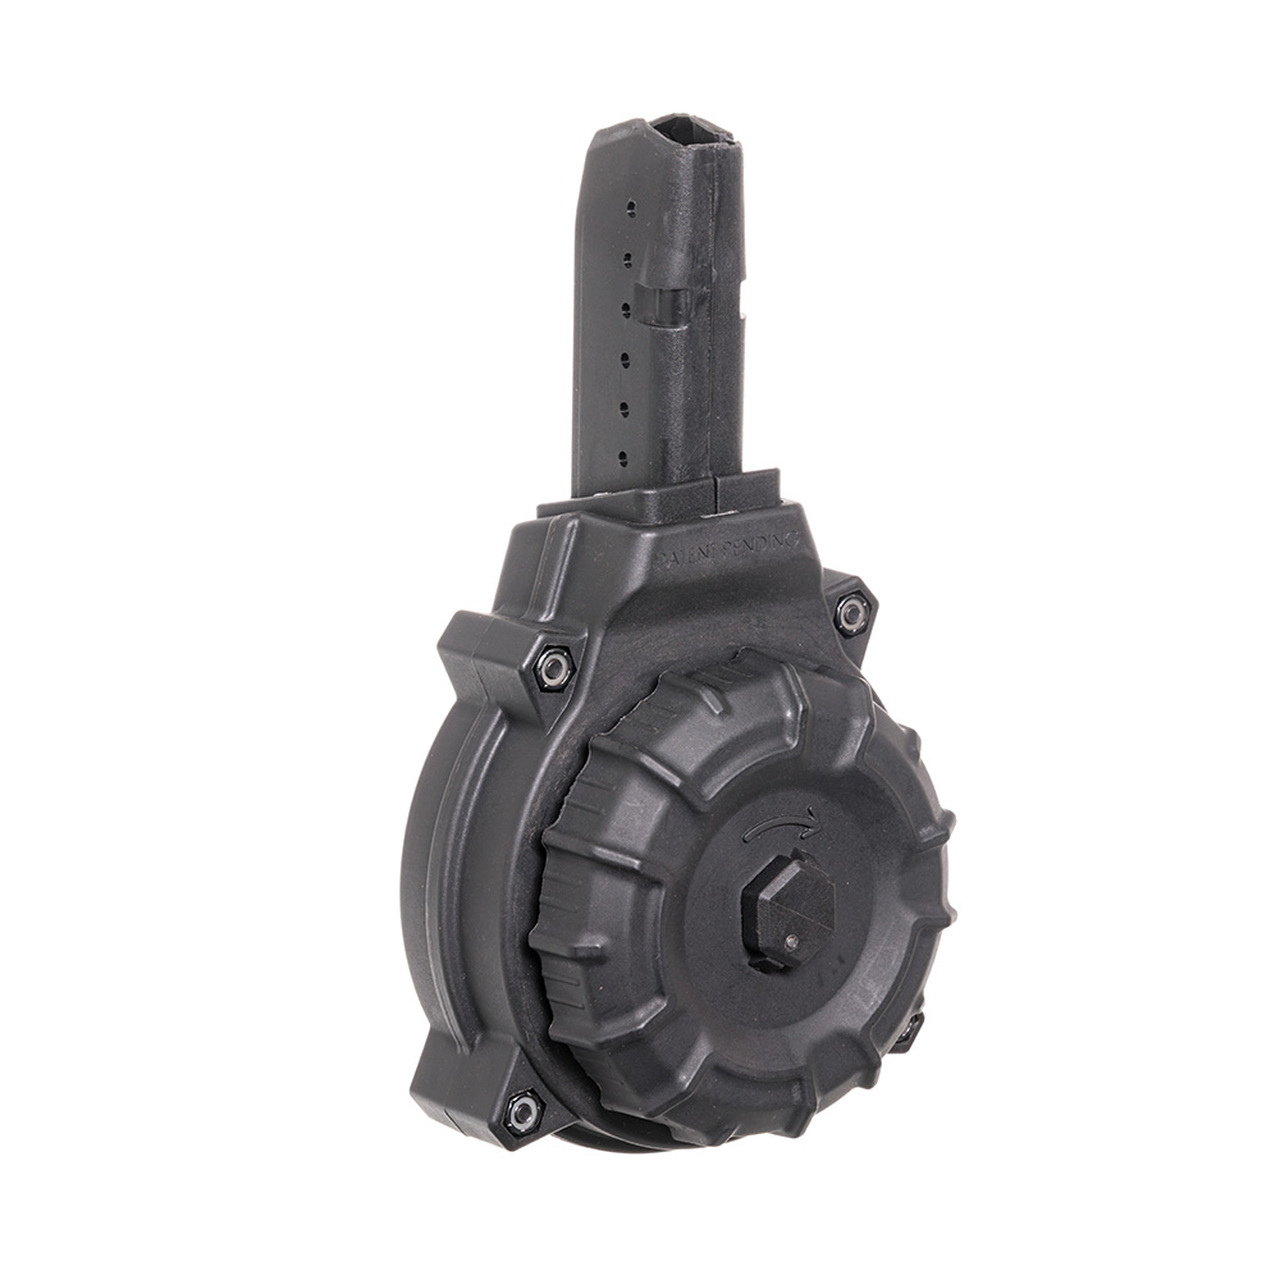 AR-15® 9mm Glock® Style Mag (50) Rd - Black Polymer Drum